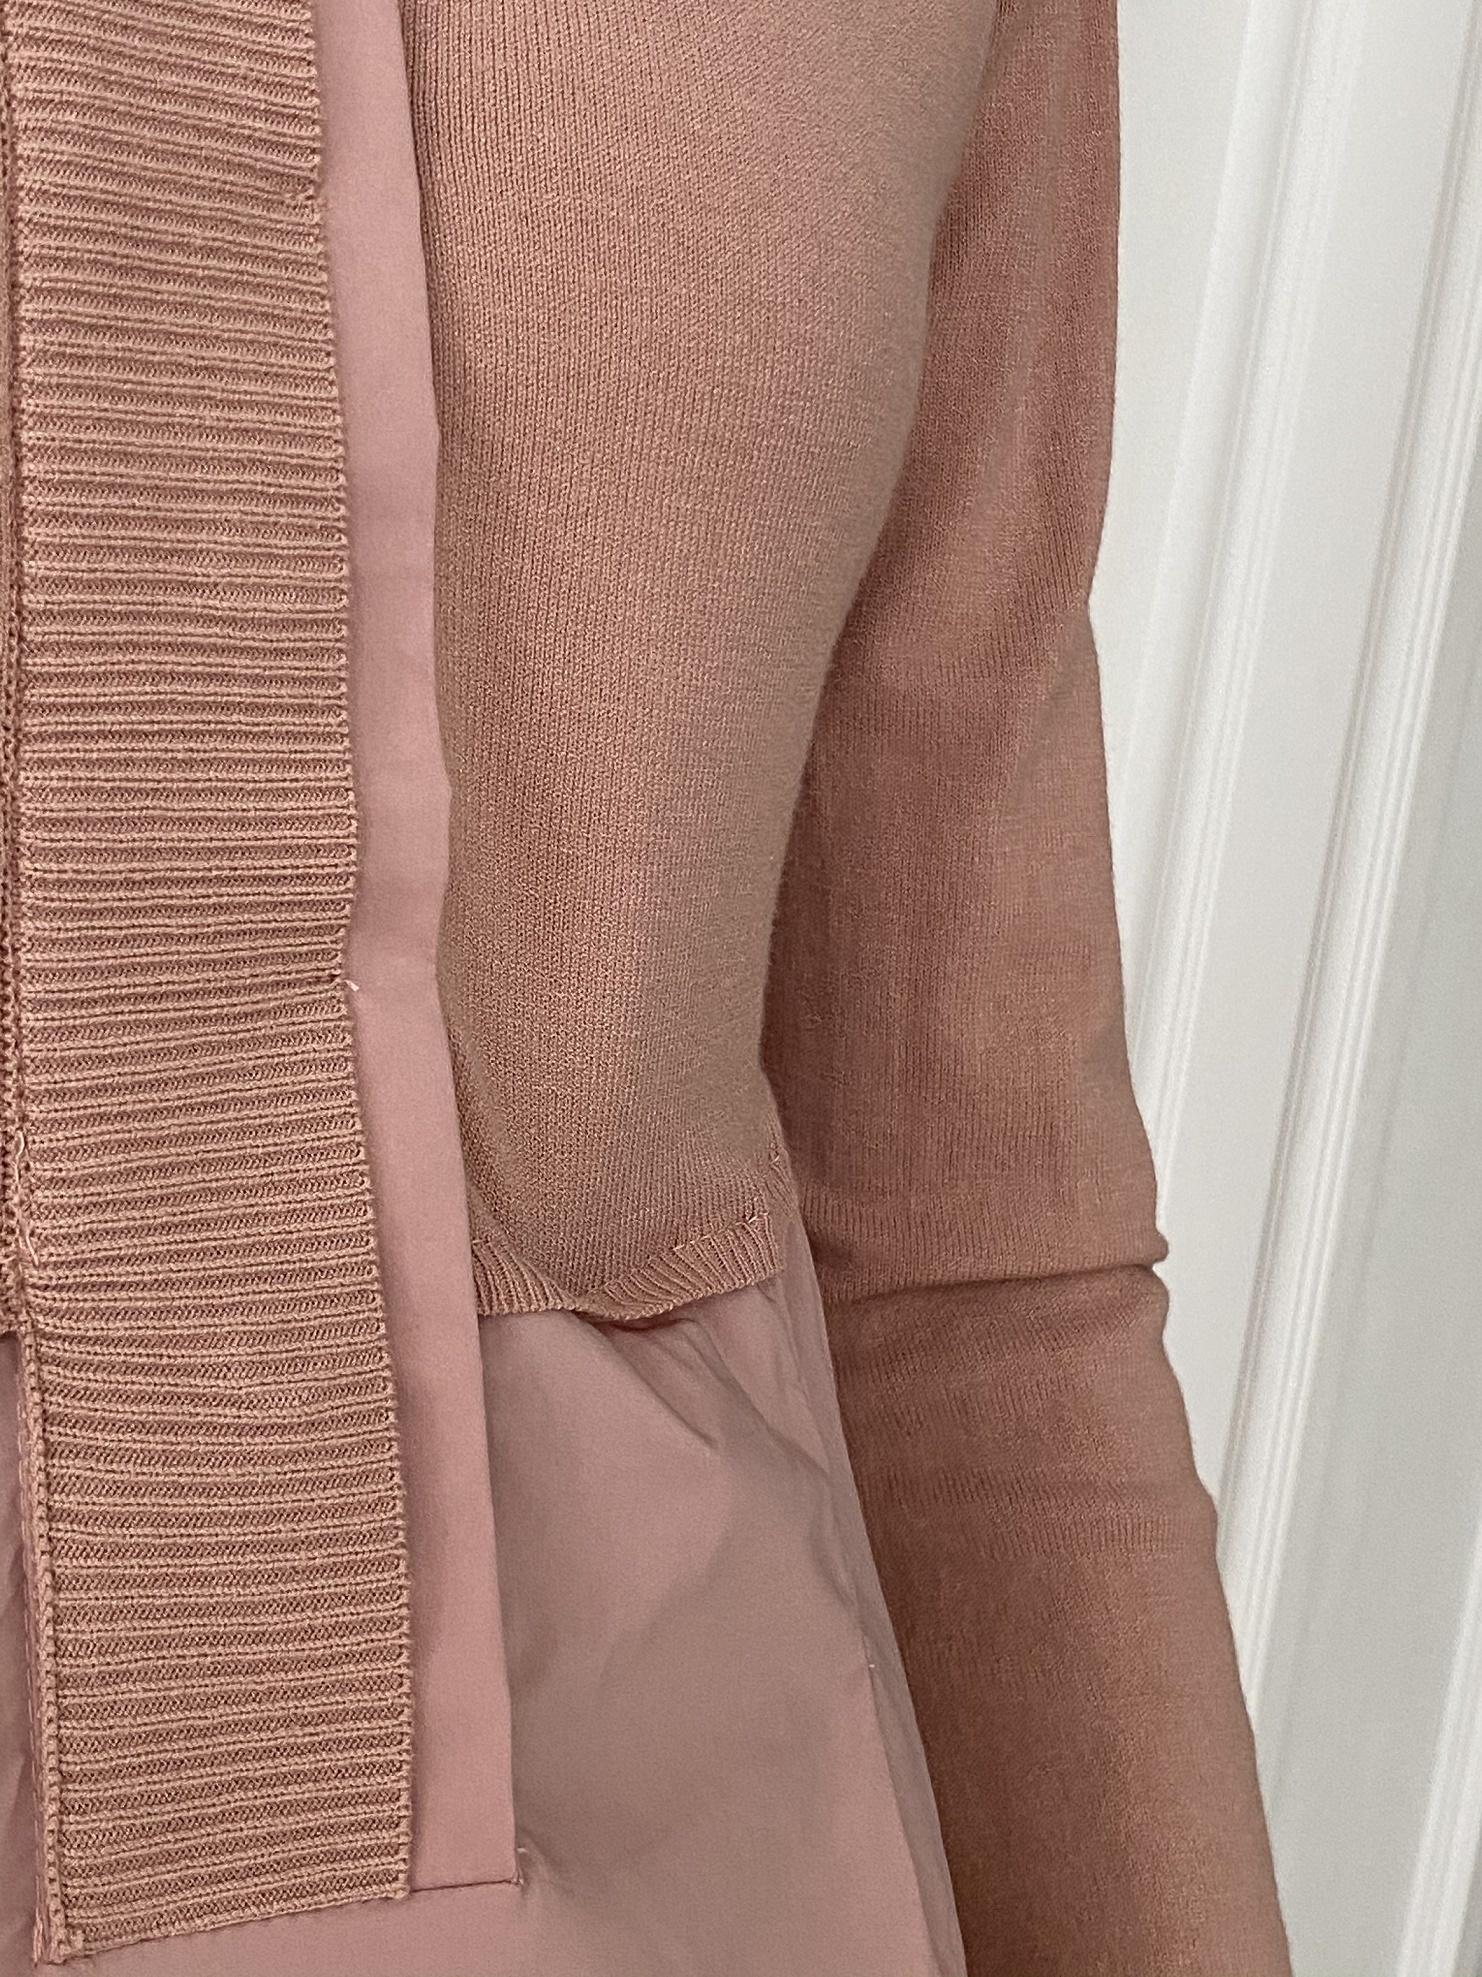 Блуза , UNO, SMART (розовый)